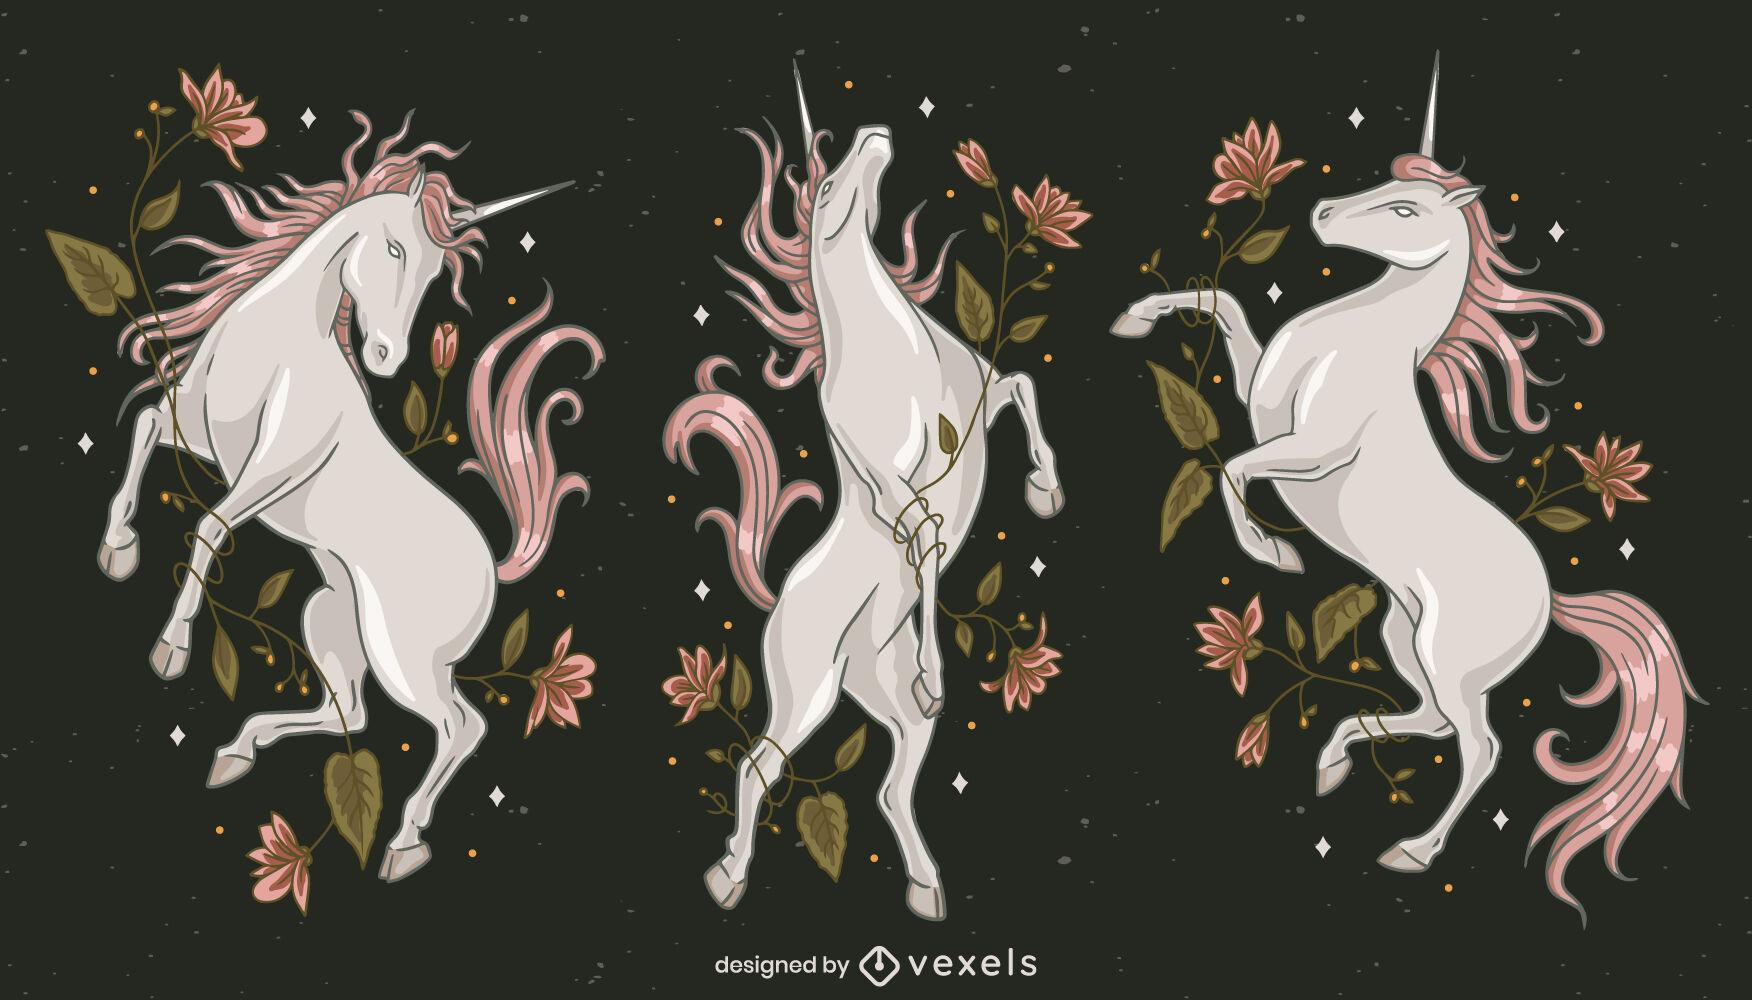 Unicorn creature magical illustration set